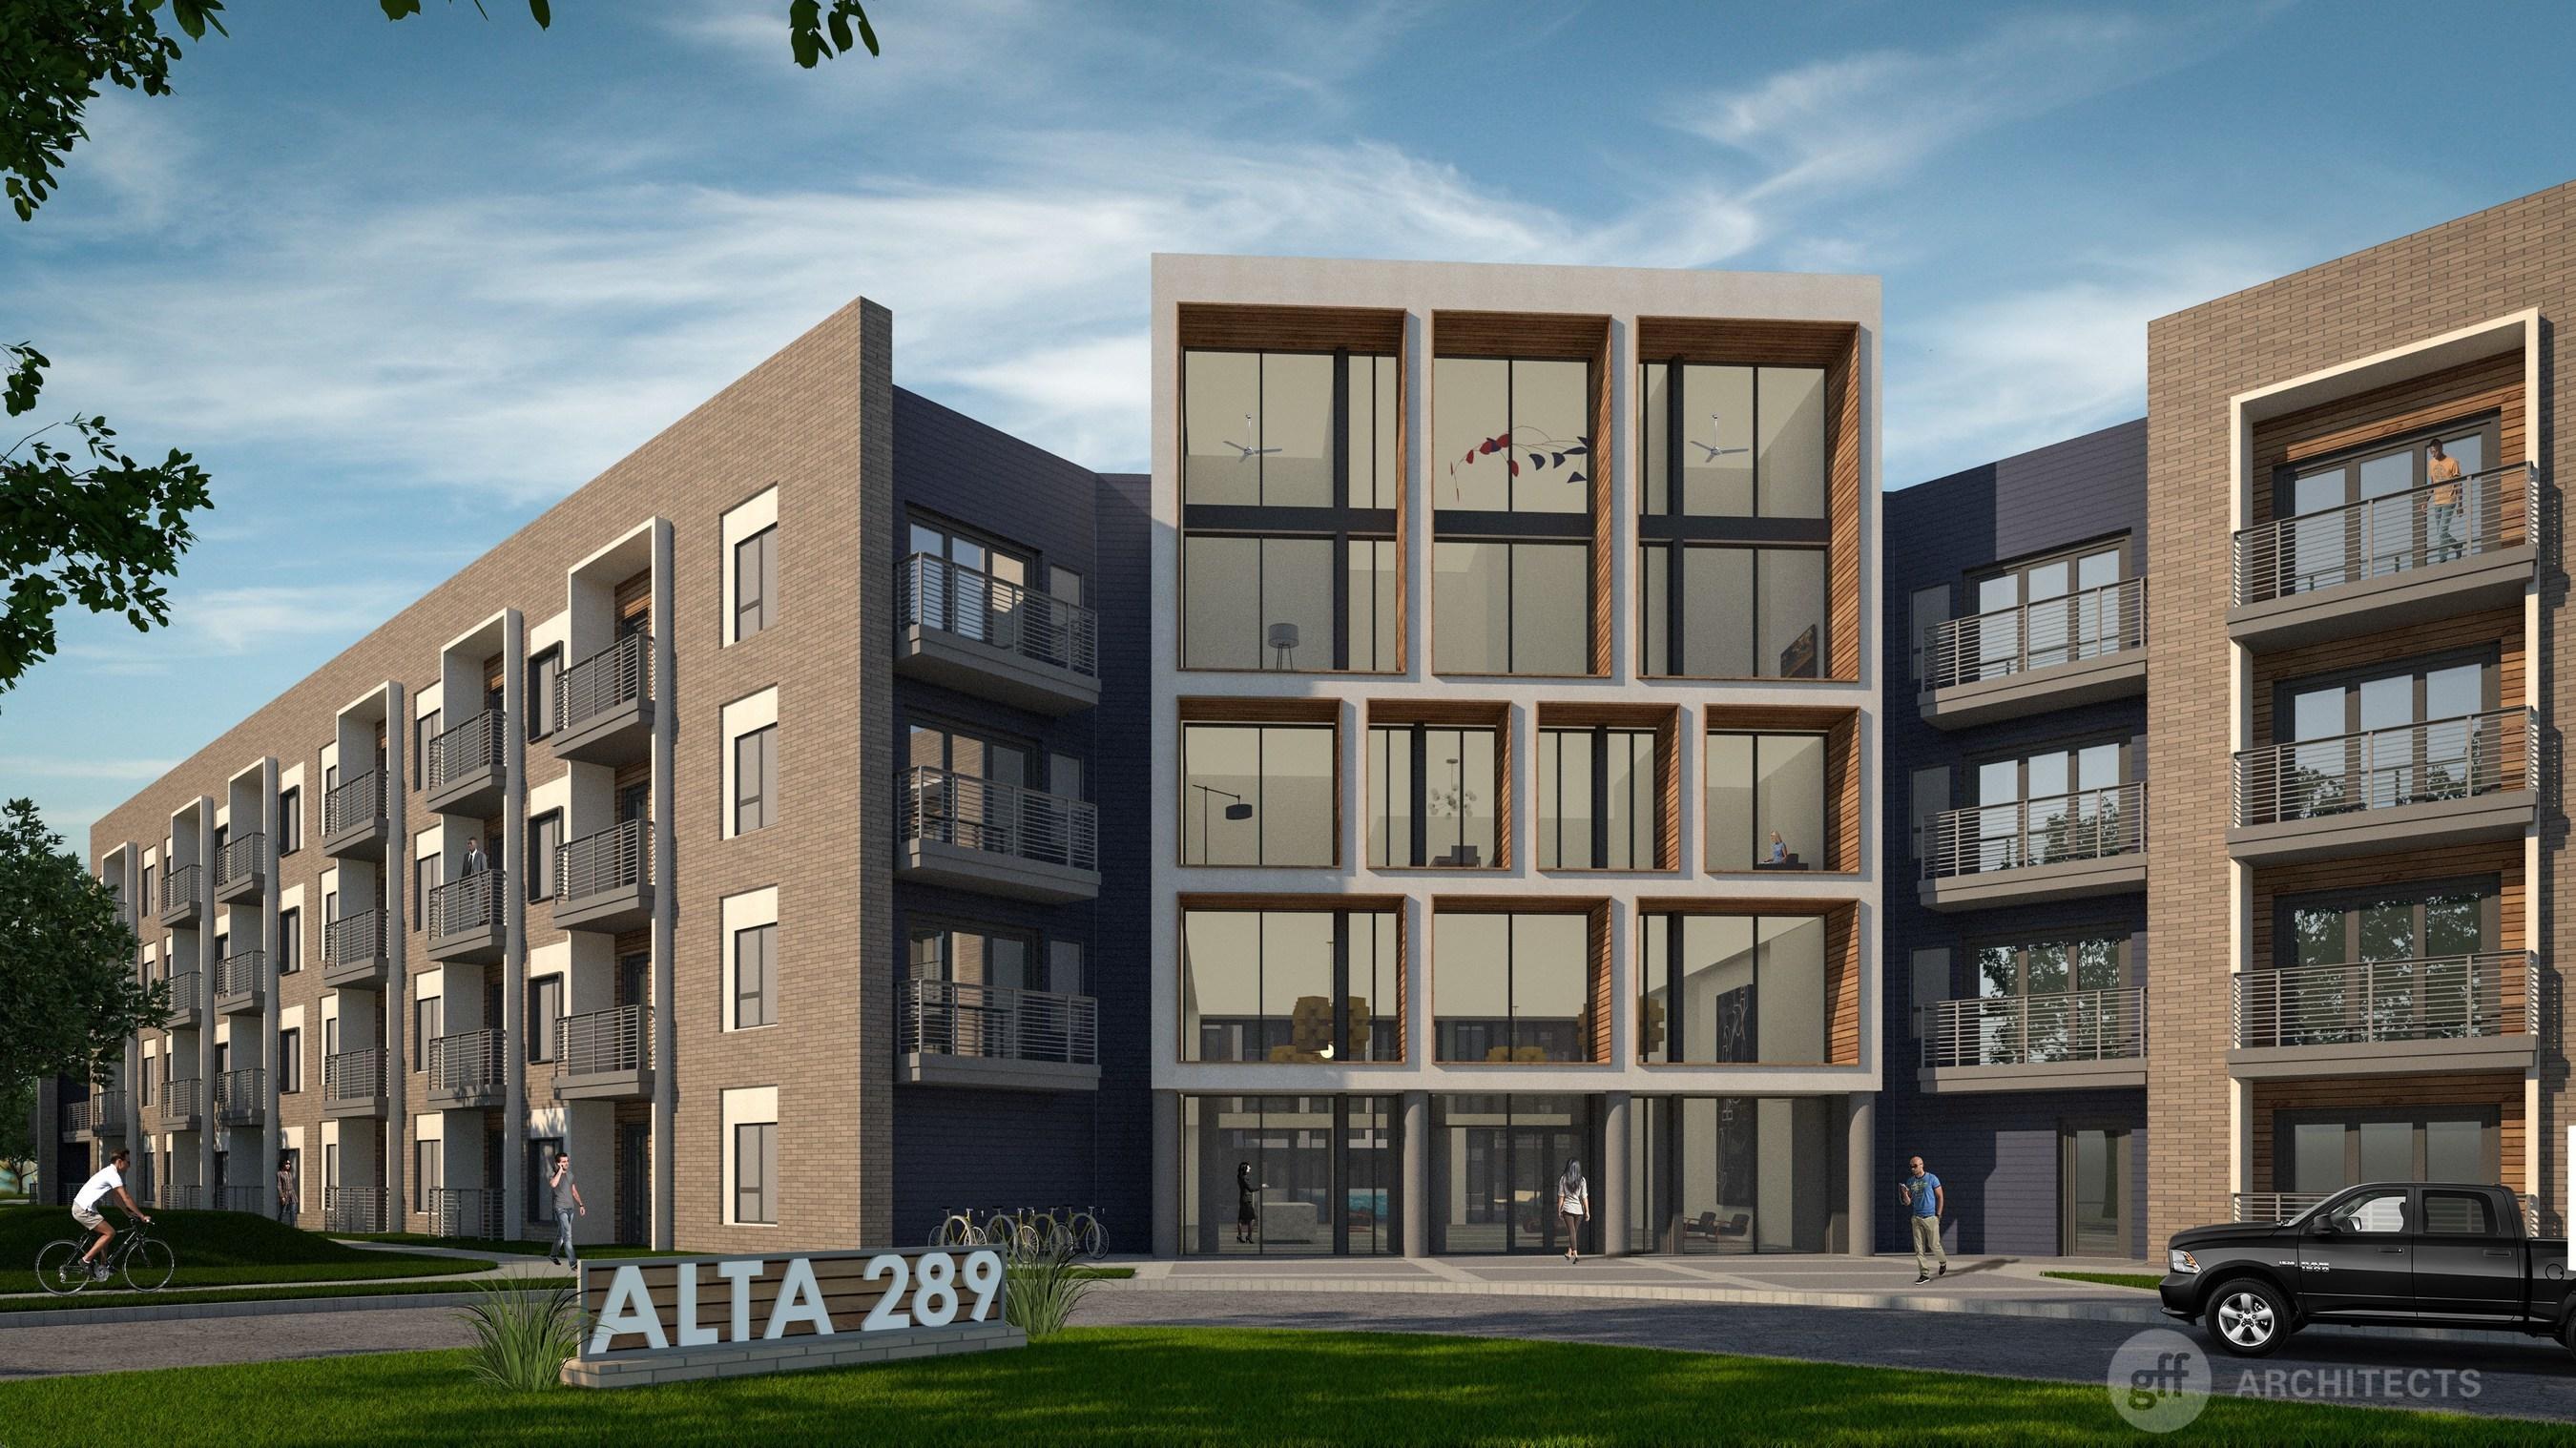 134 al shofar investment building for sale